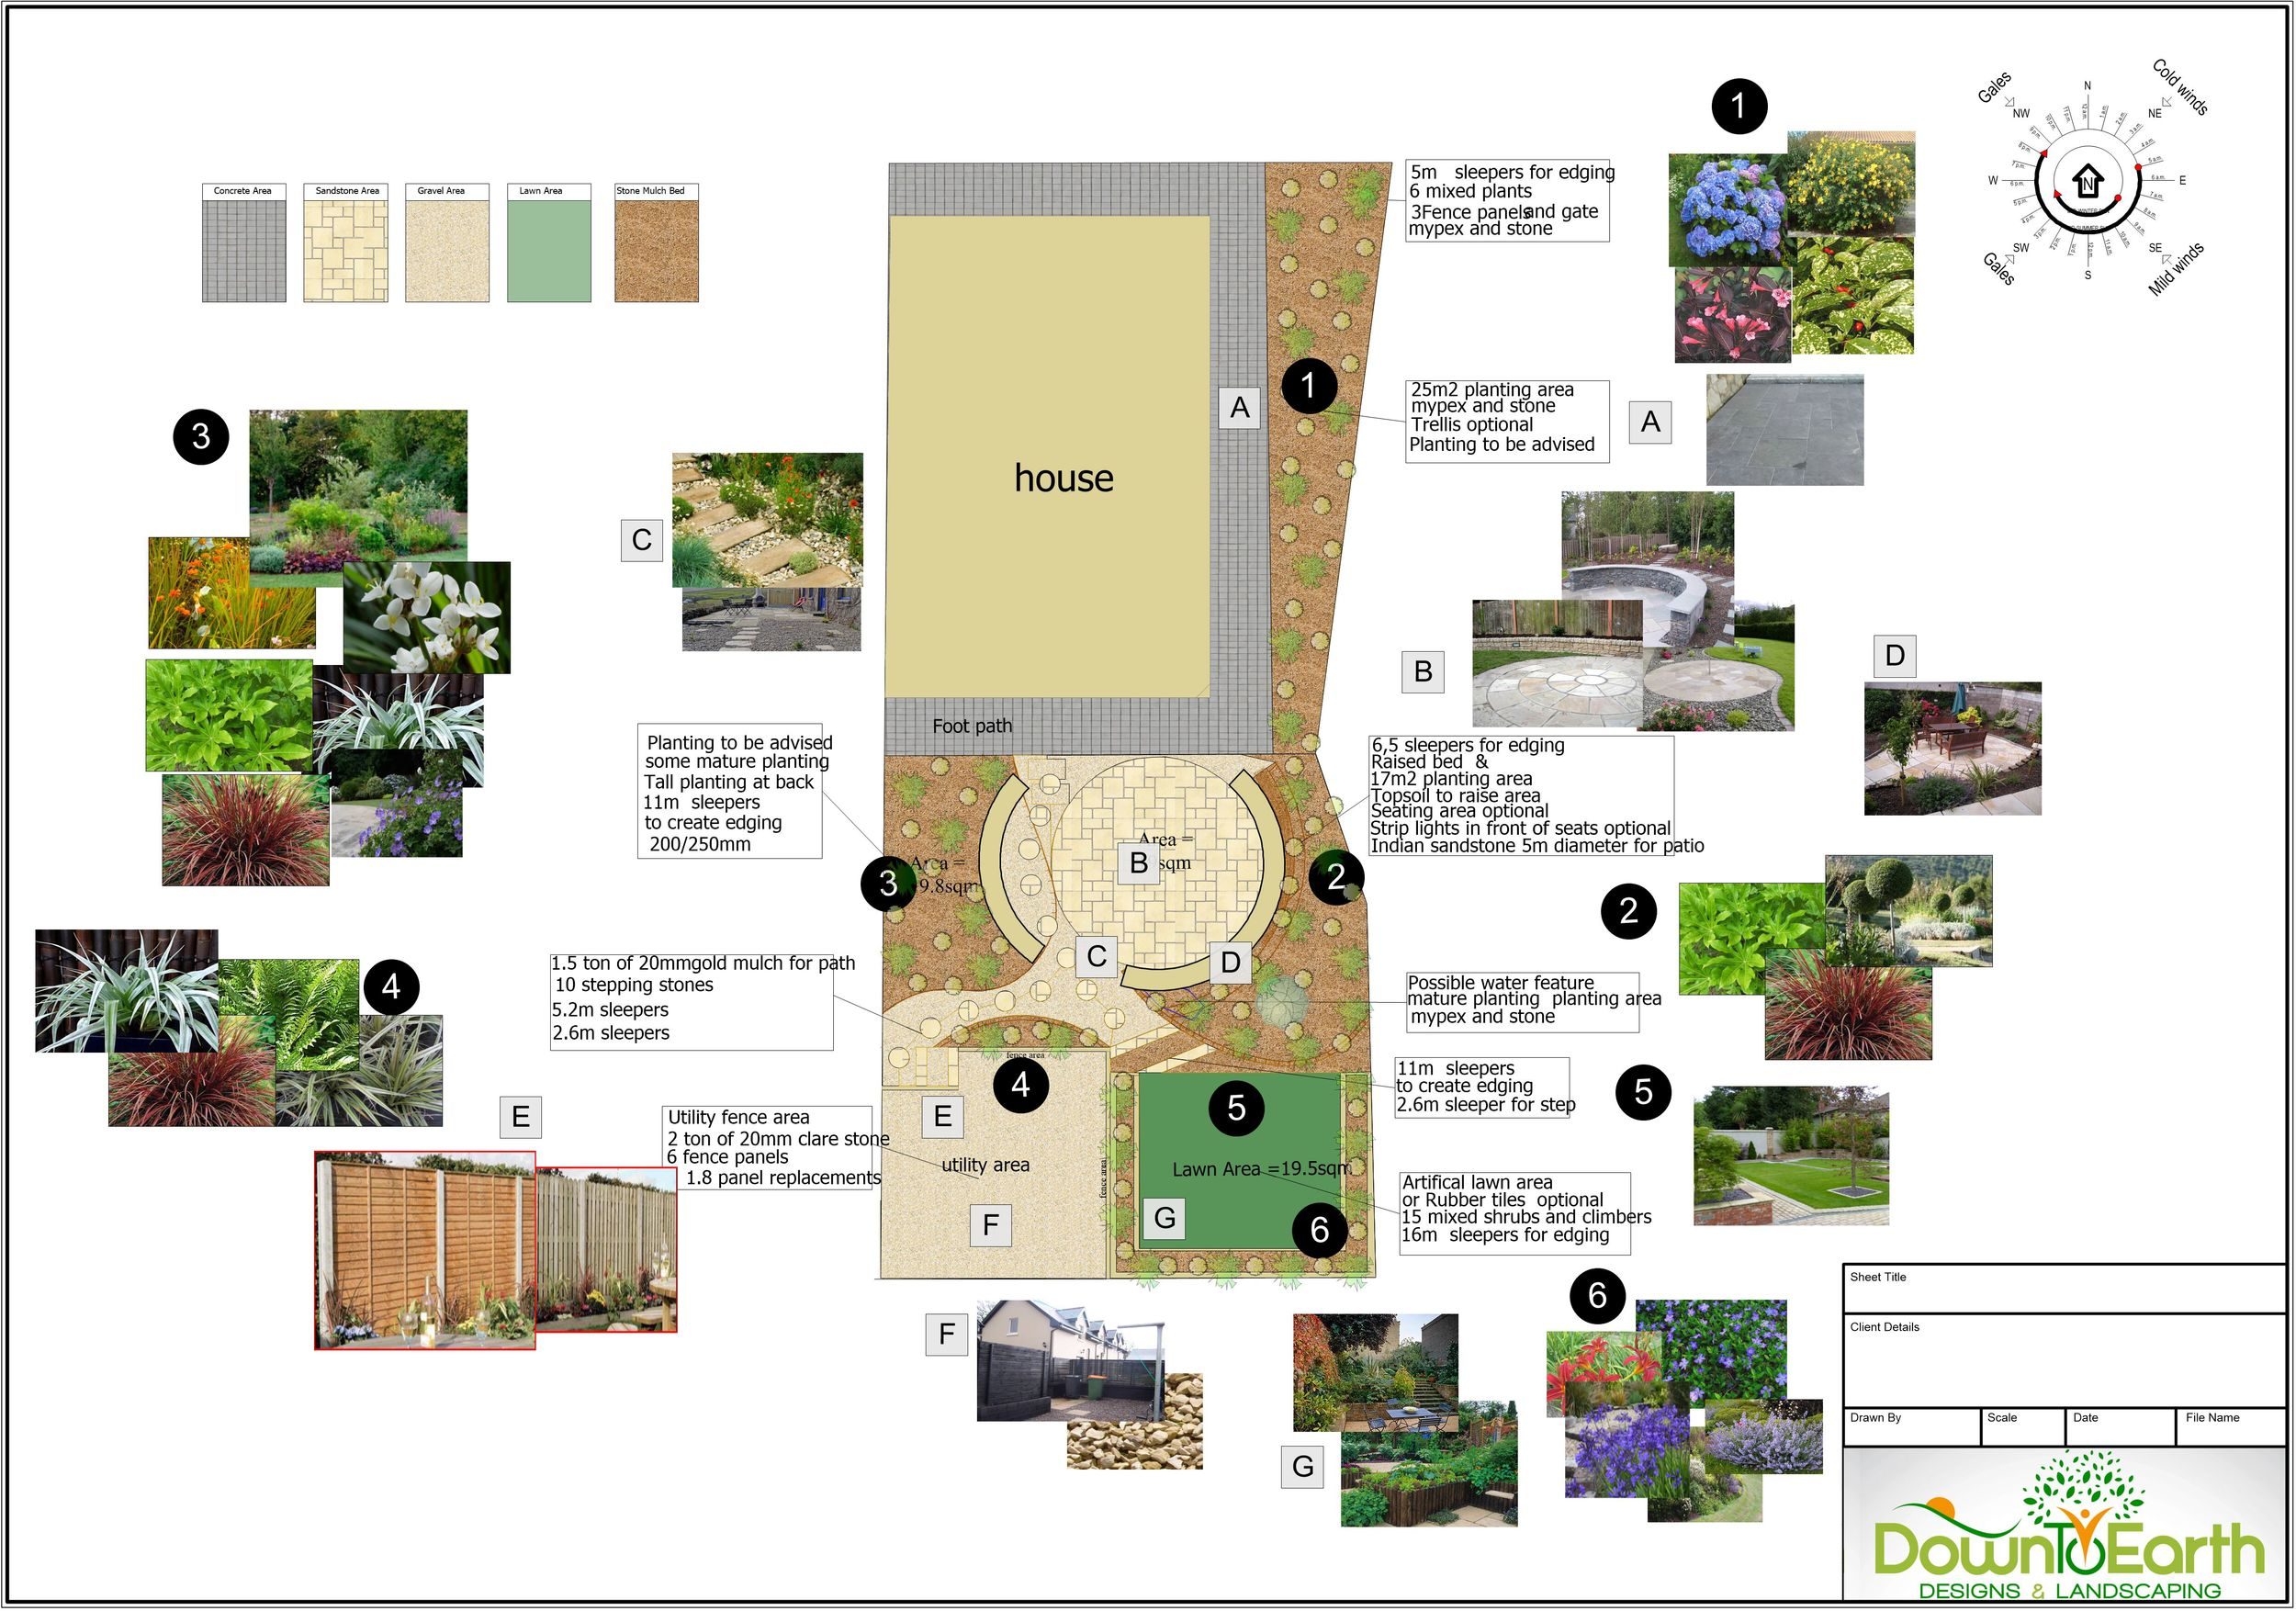 Breda O'Sullivan_Horkans_Design Concept Plan_v2.jpg